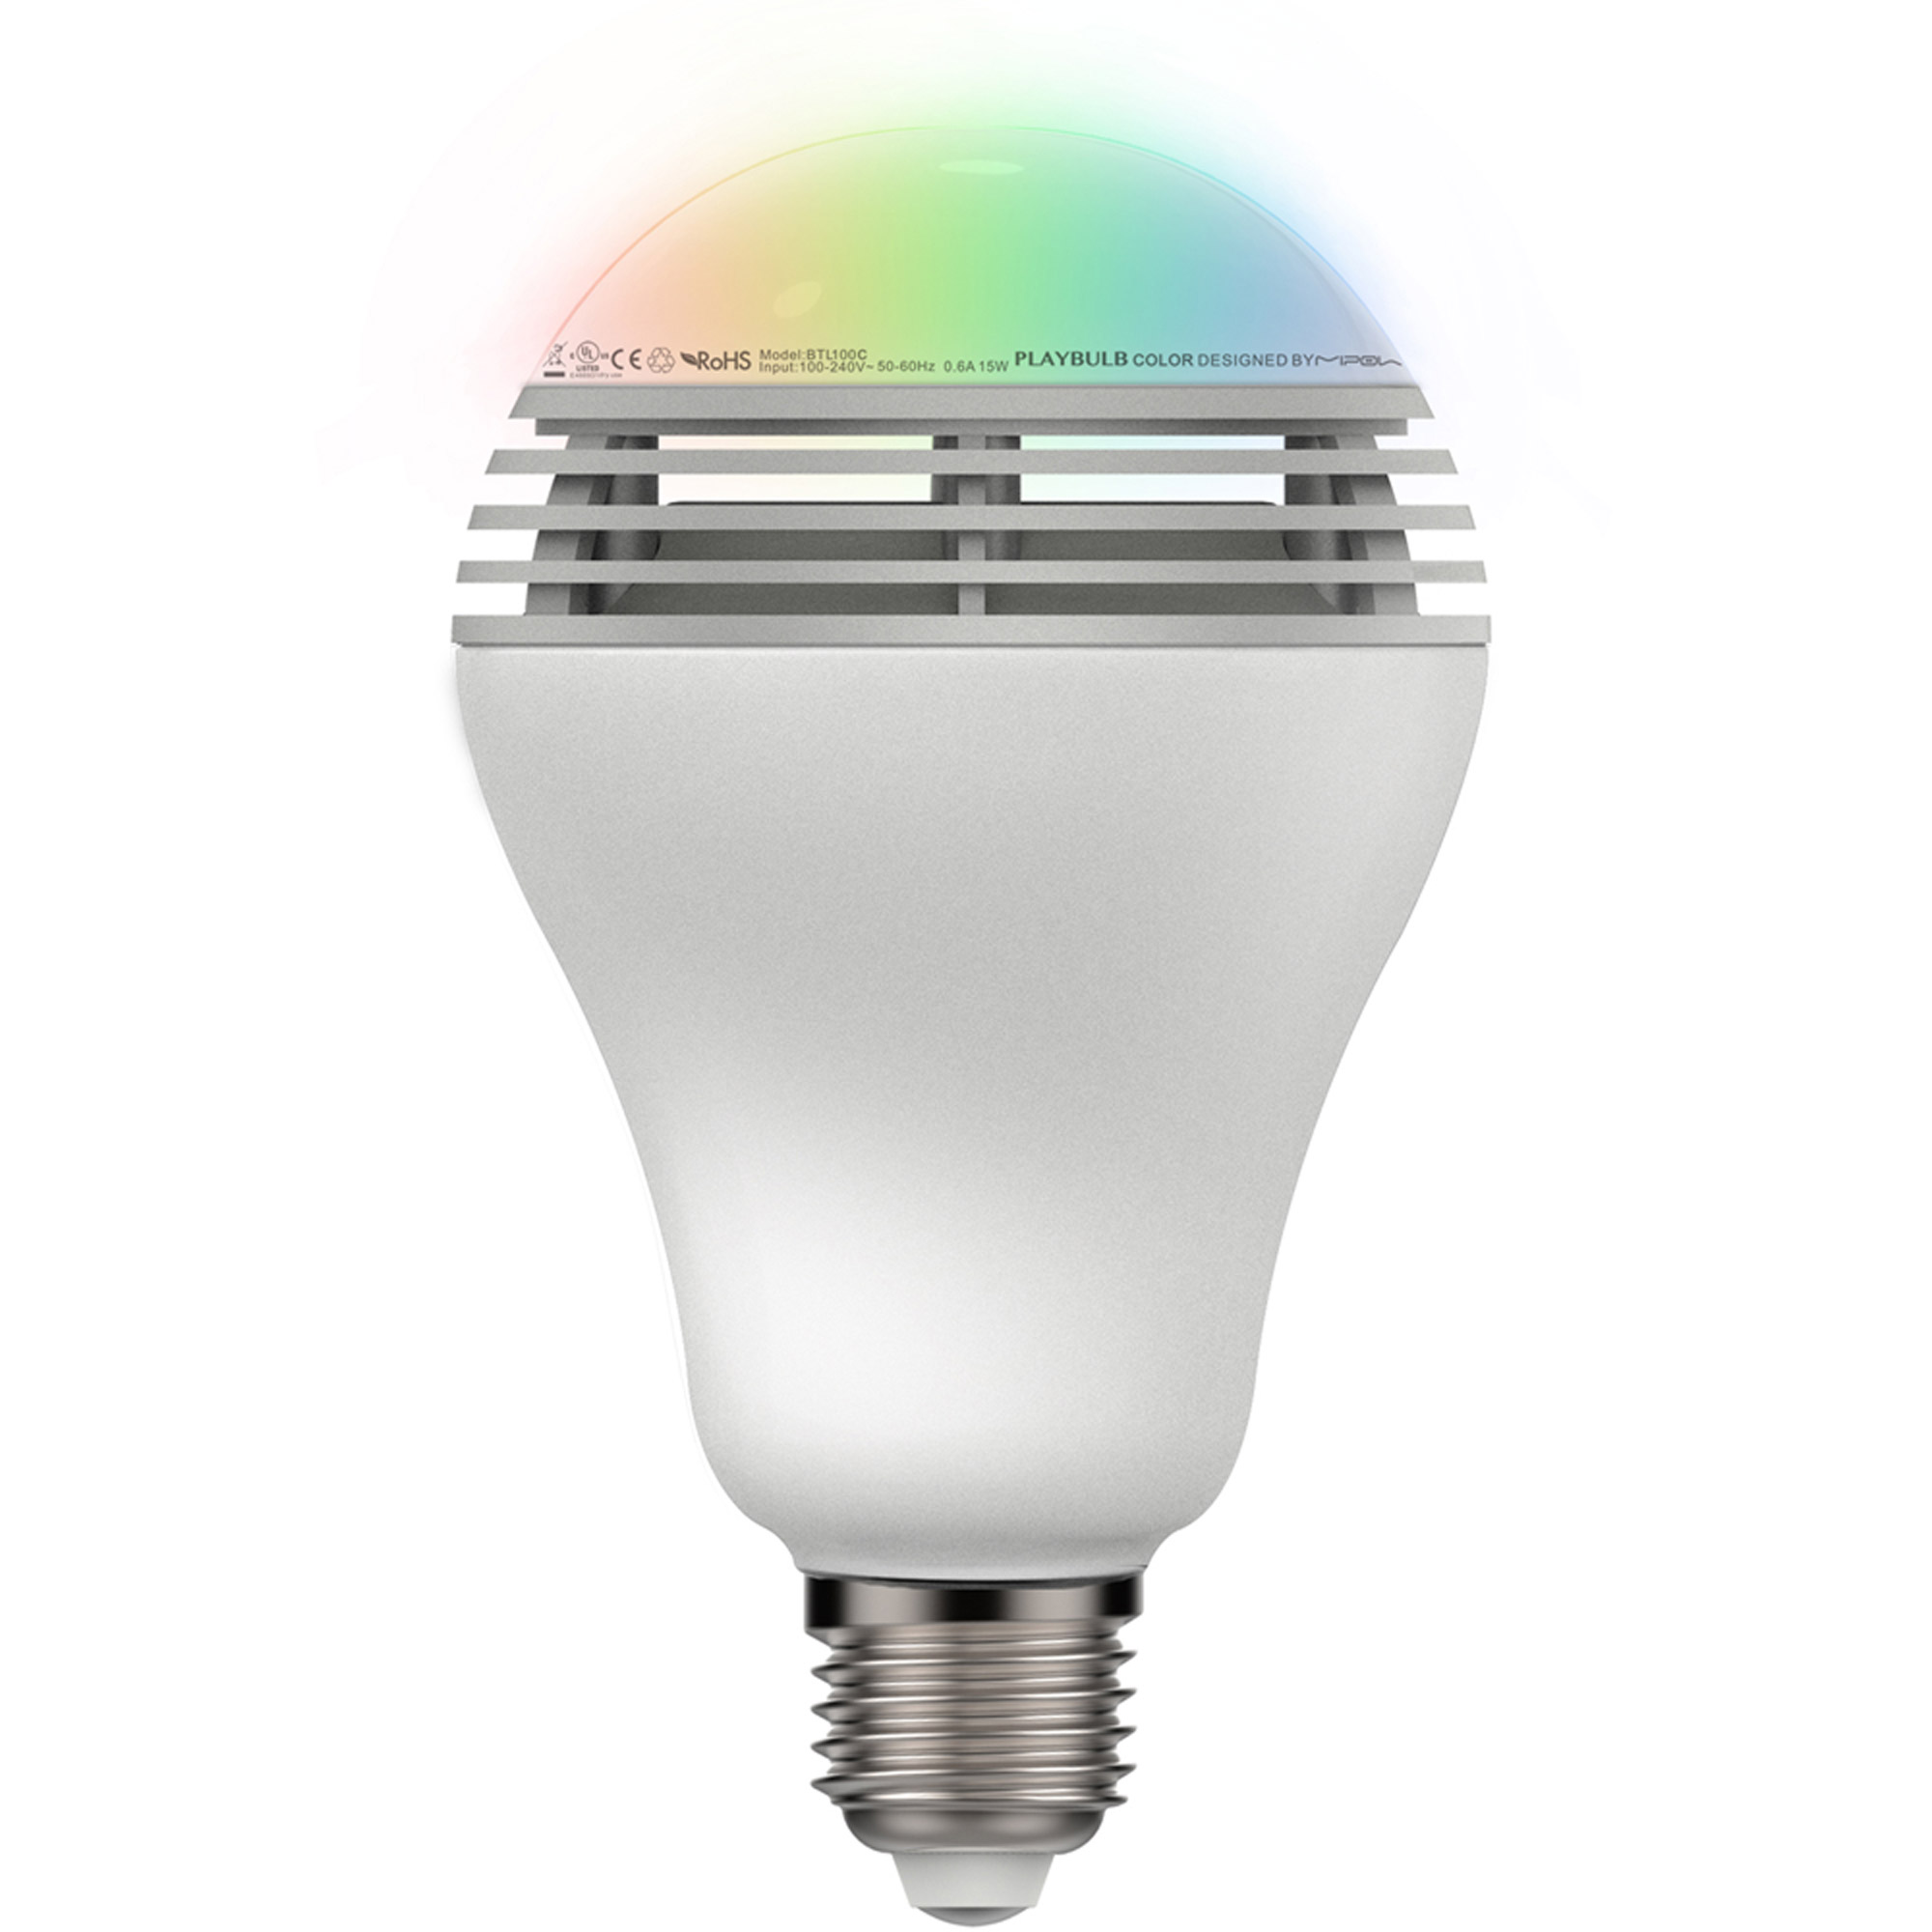 MIPOW BTL-100C-WT-WW PLAYBULB App Control Speaker Light Bulb, Warm White